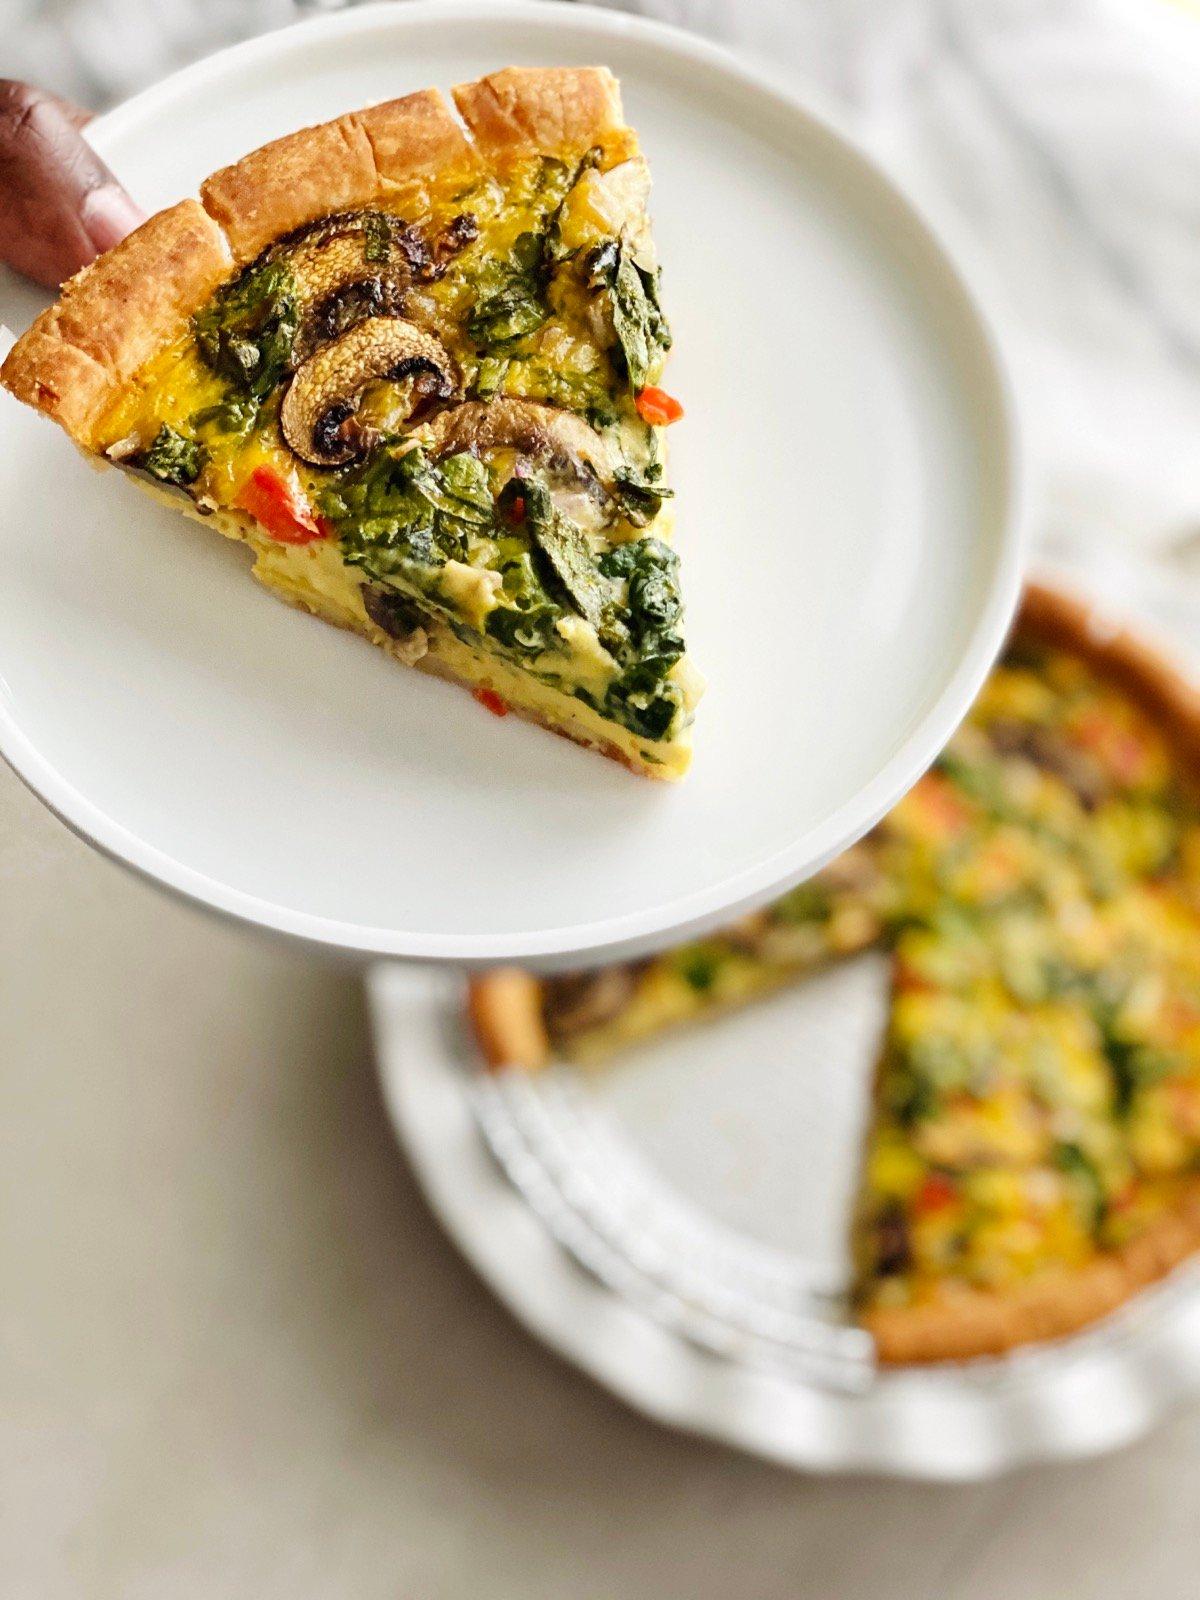 Slice of vegan gluten-free quiche on a plate